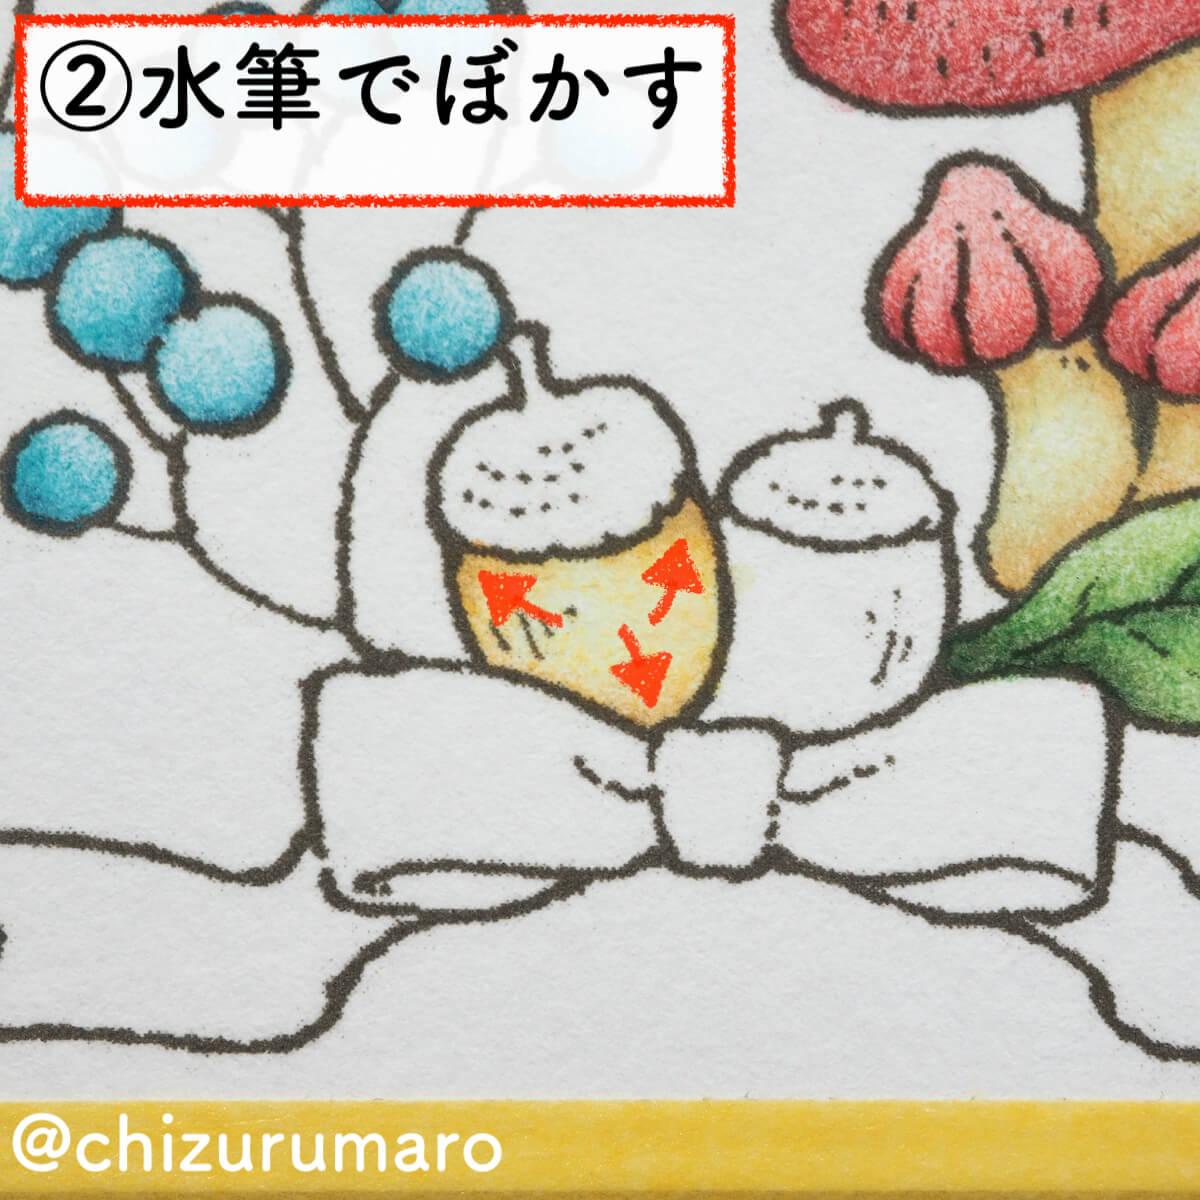 f:id:chizurumaro:20200218125256j:plain